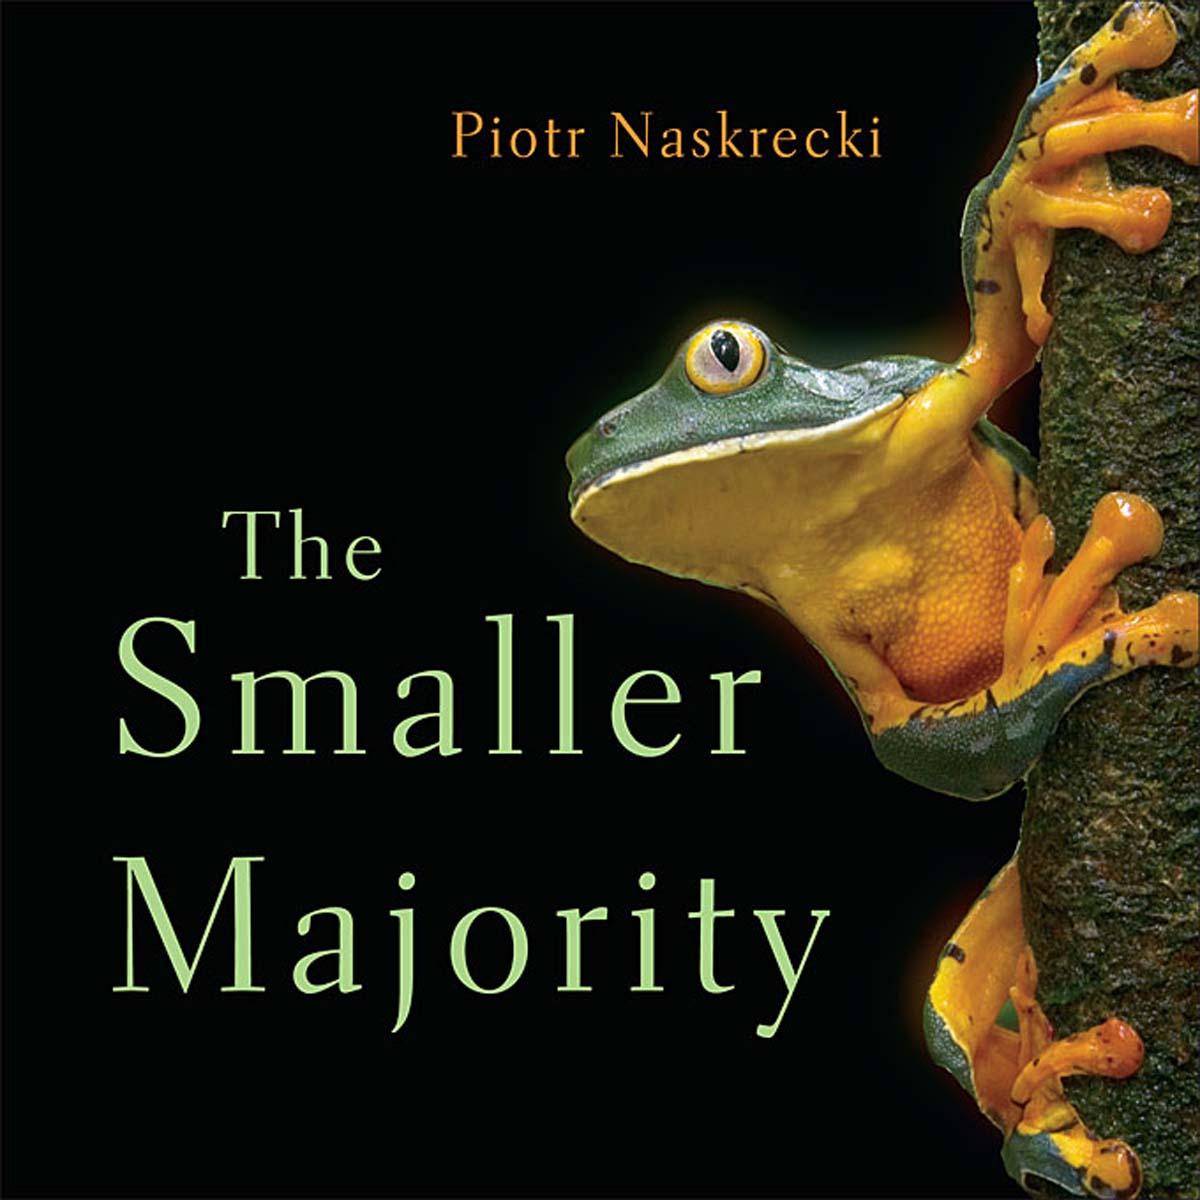 The Smaller Majority